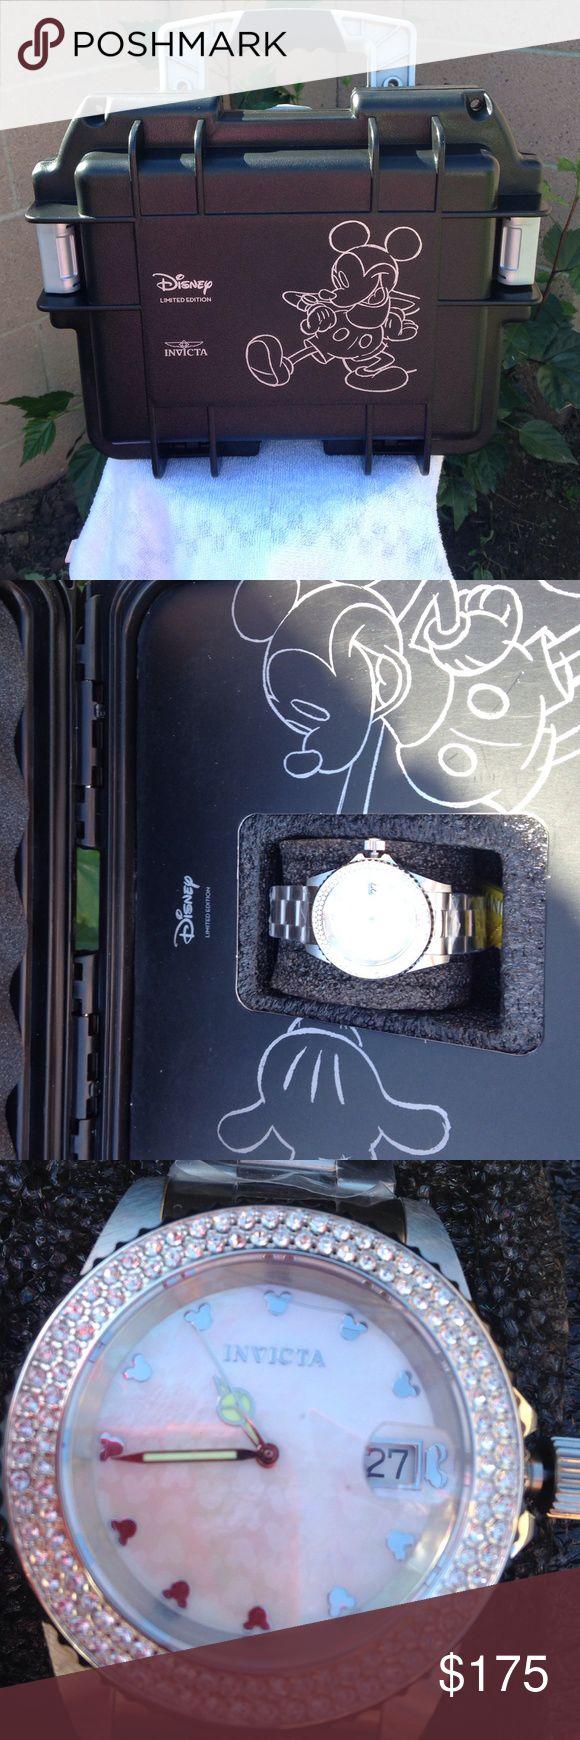 NIB Invicta Mickey Watch NIB Invicta Numbered LIMITED EDITION MICKEY Watch. INVICTA Accessories Watches